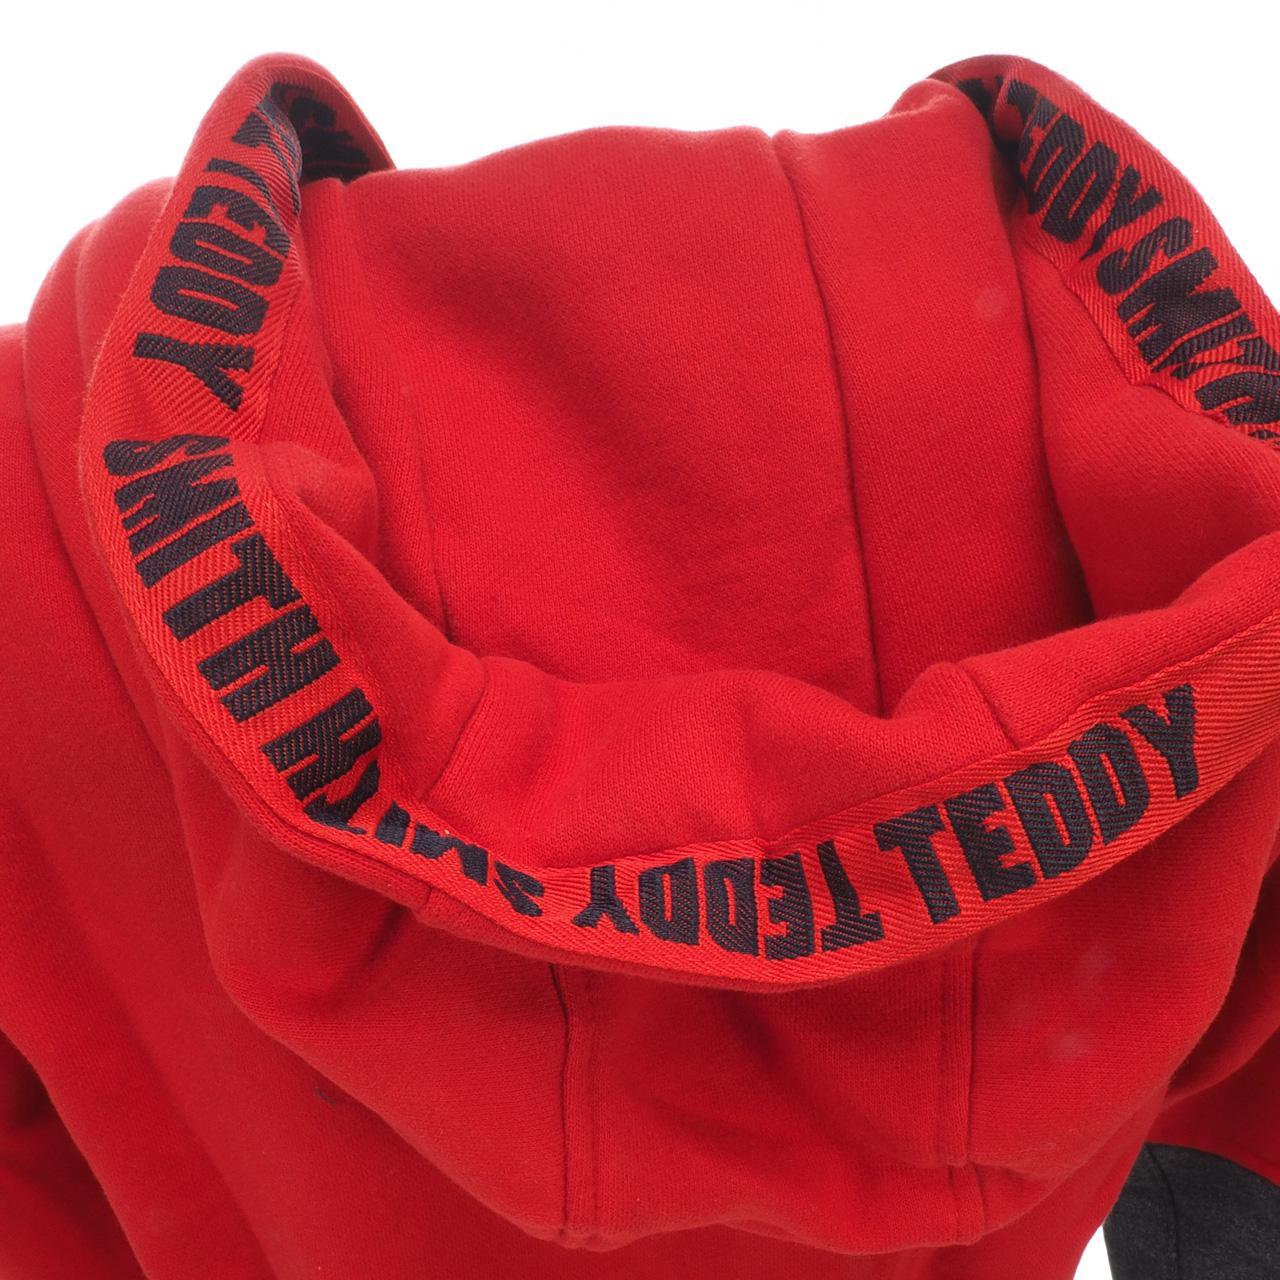 Jacken-Sweatshirts-Zipped-Kapuze-Teddy-Smith-Gafe-Blood-Fz-Umhang-Sw-Jr-Rot Indexbild 2